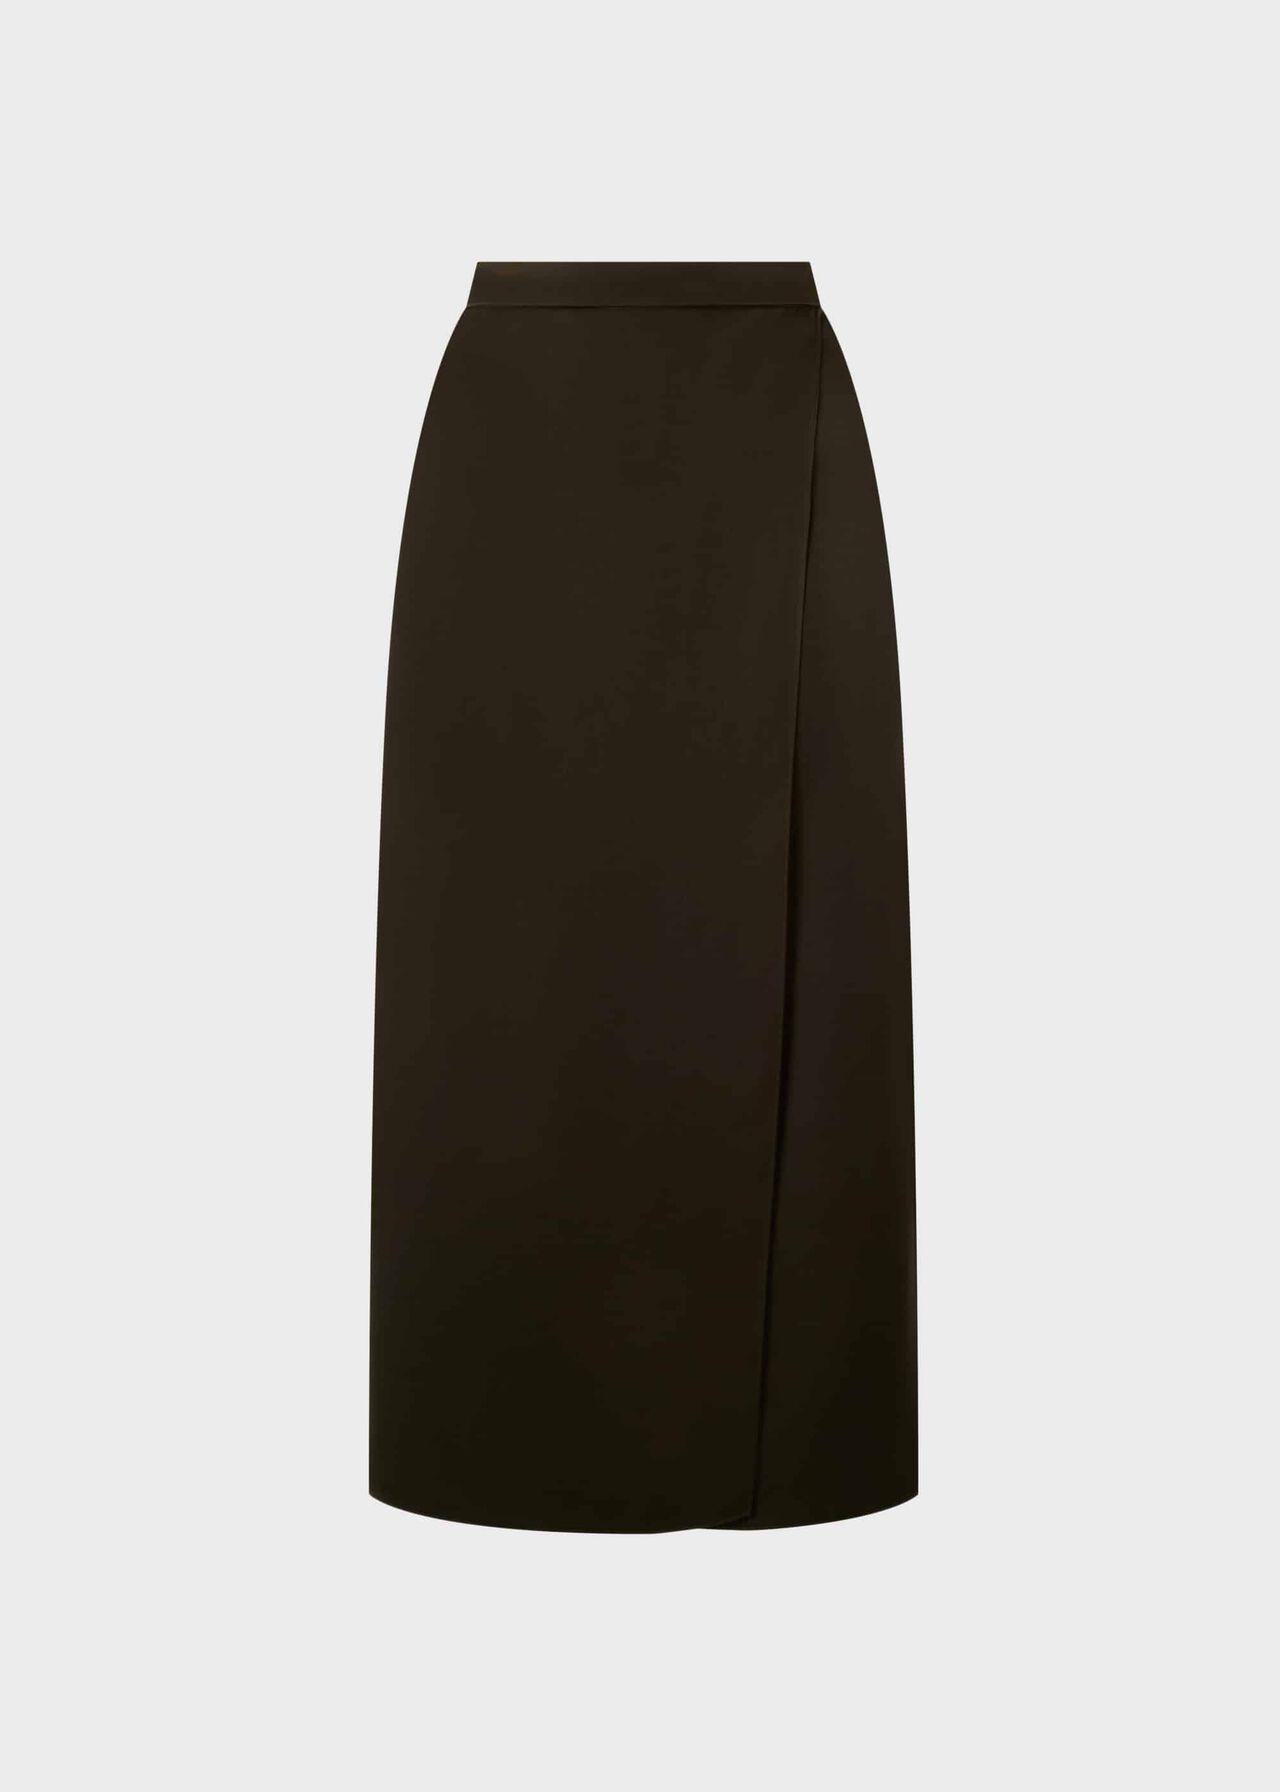 Dionne Skirt Dark Green